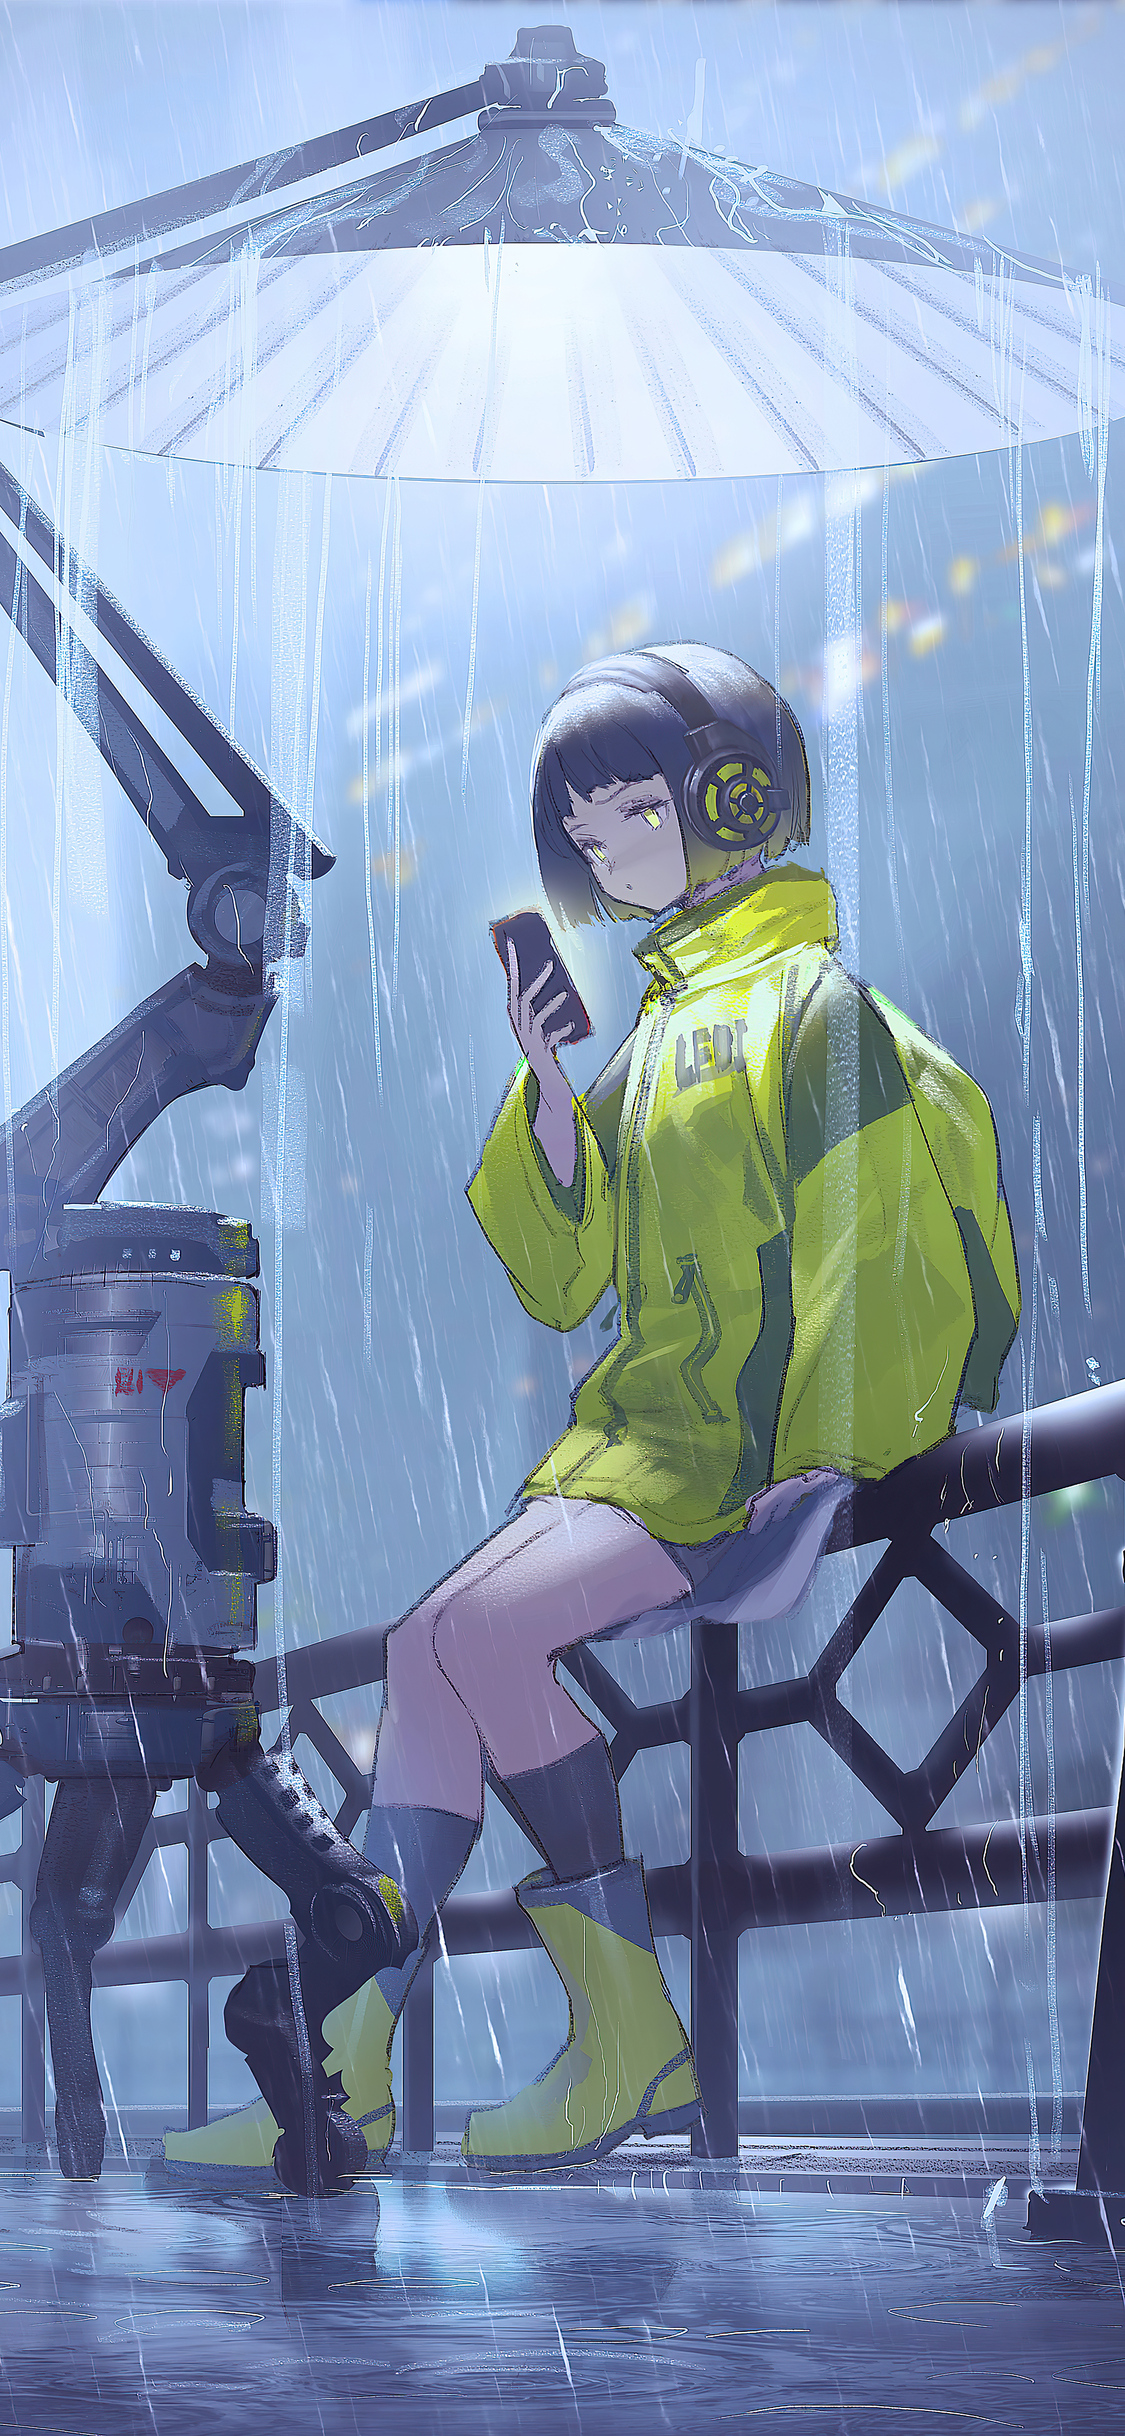 1125x2436 Meiko Vocaloid Anime Girl 4k Iphone XS,Iphone 10